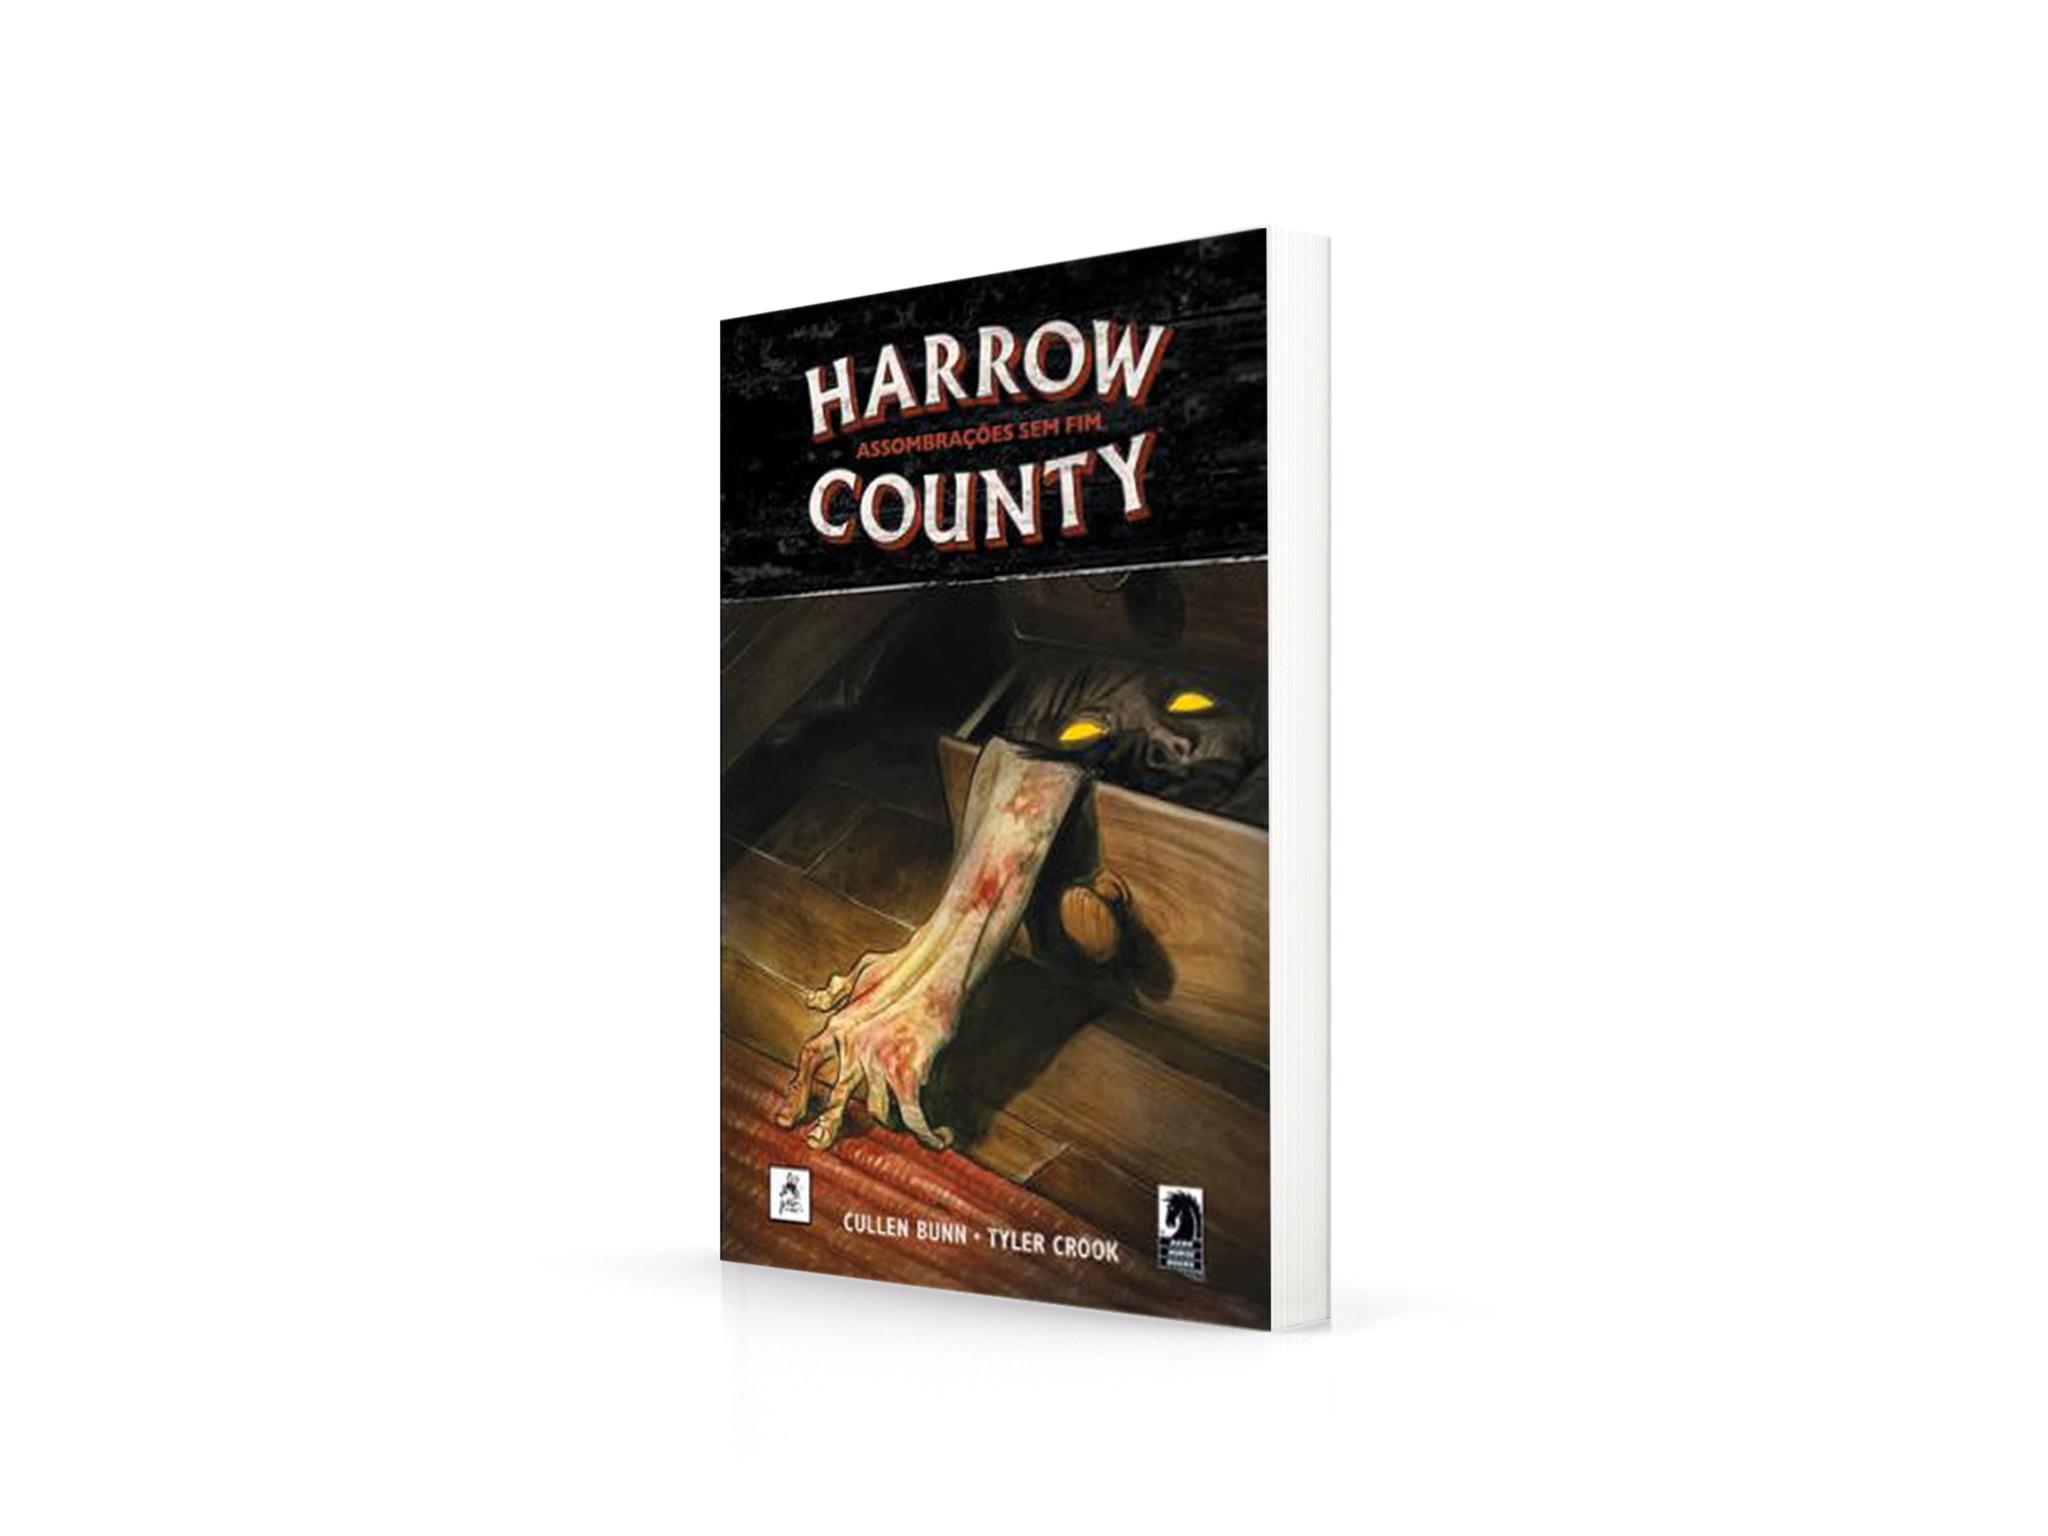 Livro, Terror, Harrow Country - Assombrações Sem Fim, Cullen Bunin, Tyler Crook